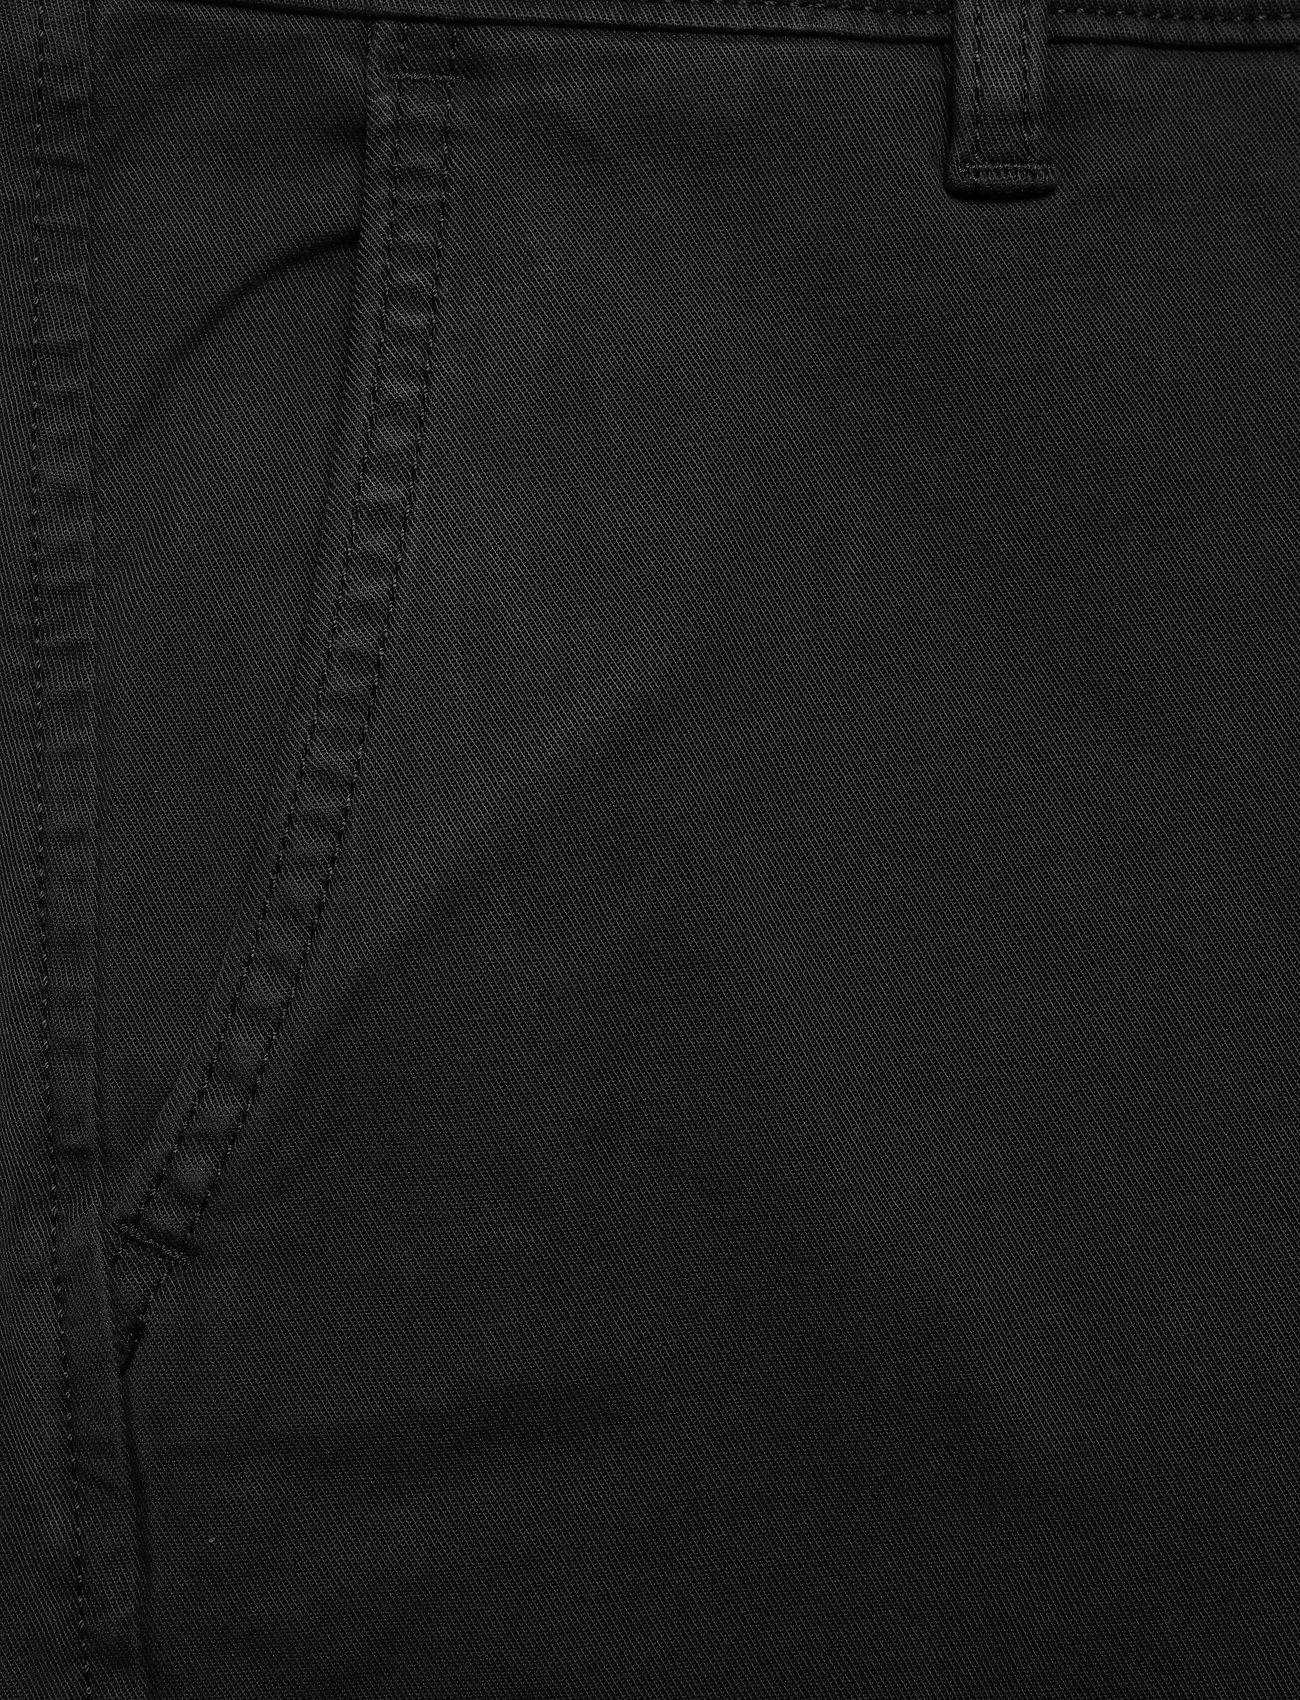 LEVI´S Men - XX CHINO STD II MINERAL BLACK - chino's - blacks - 4